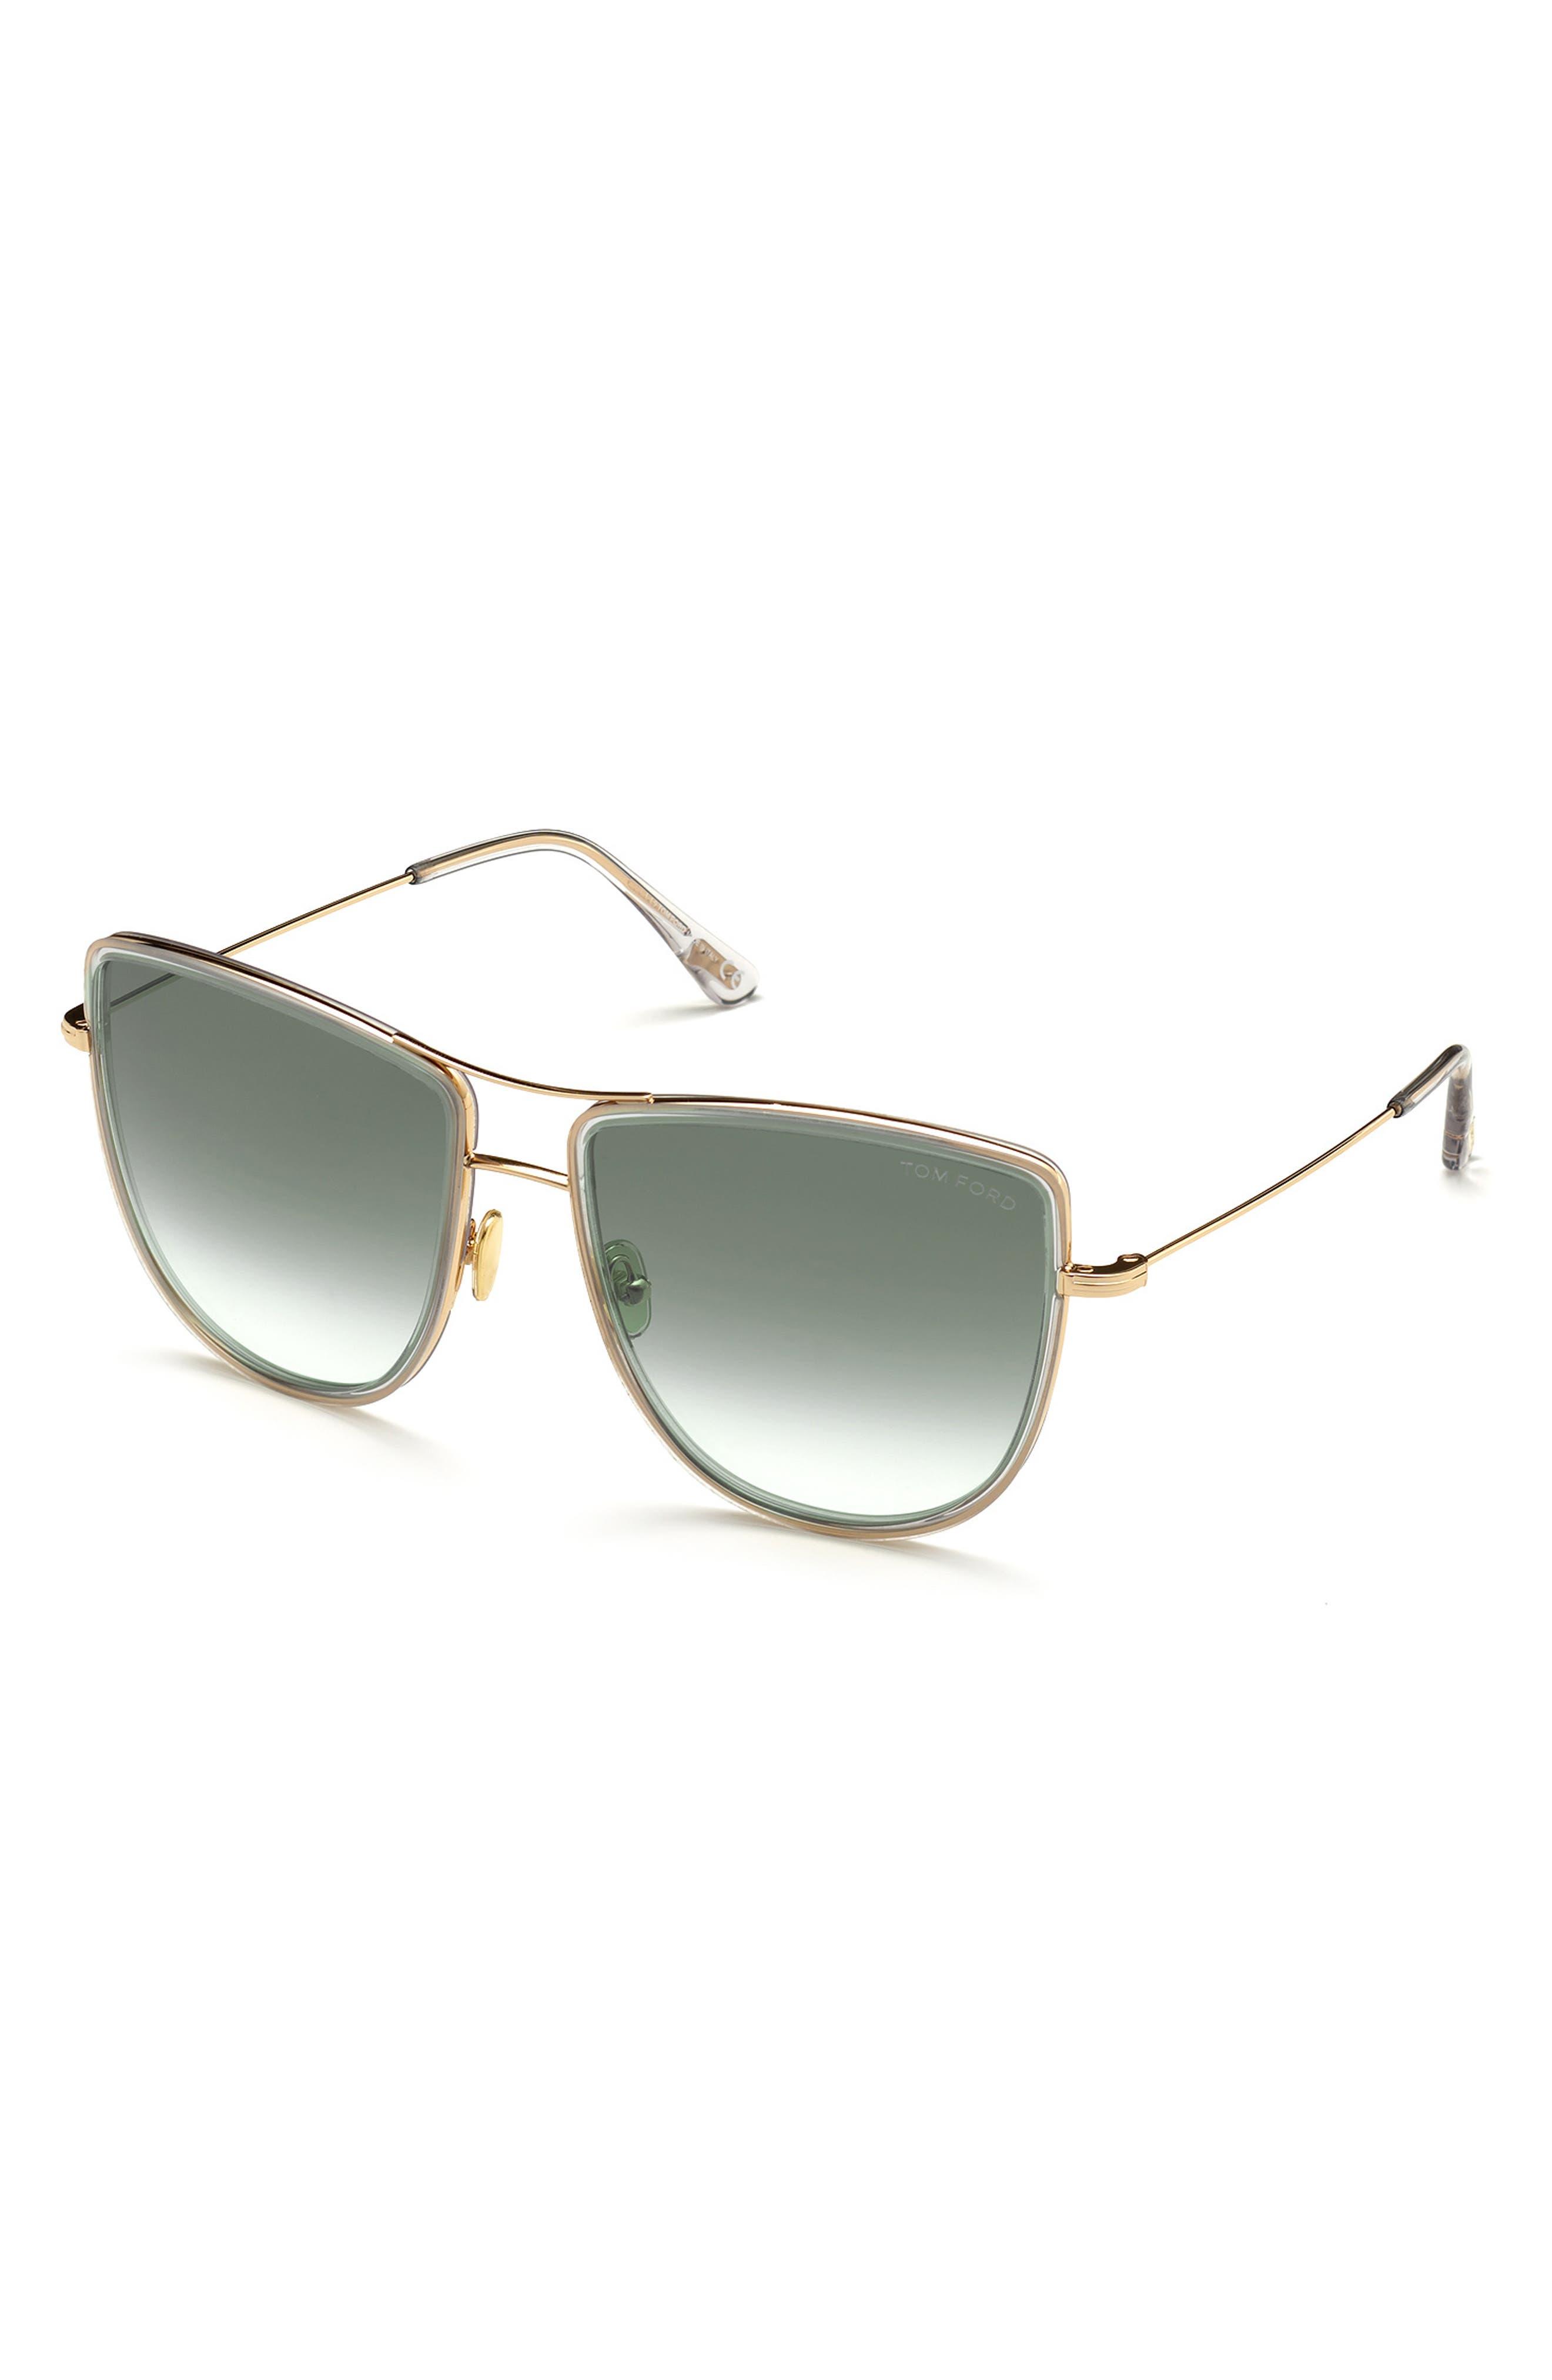 Image of Tom Ford Tina 59mm Aviator Sunglasses